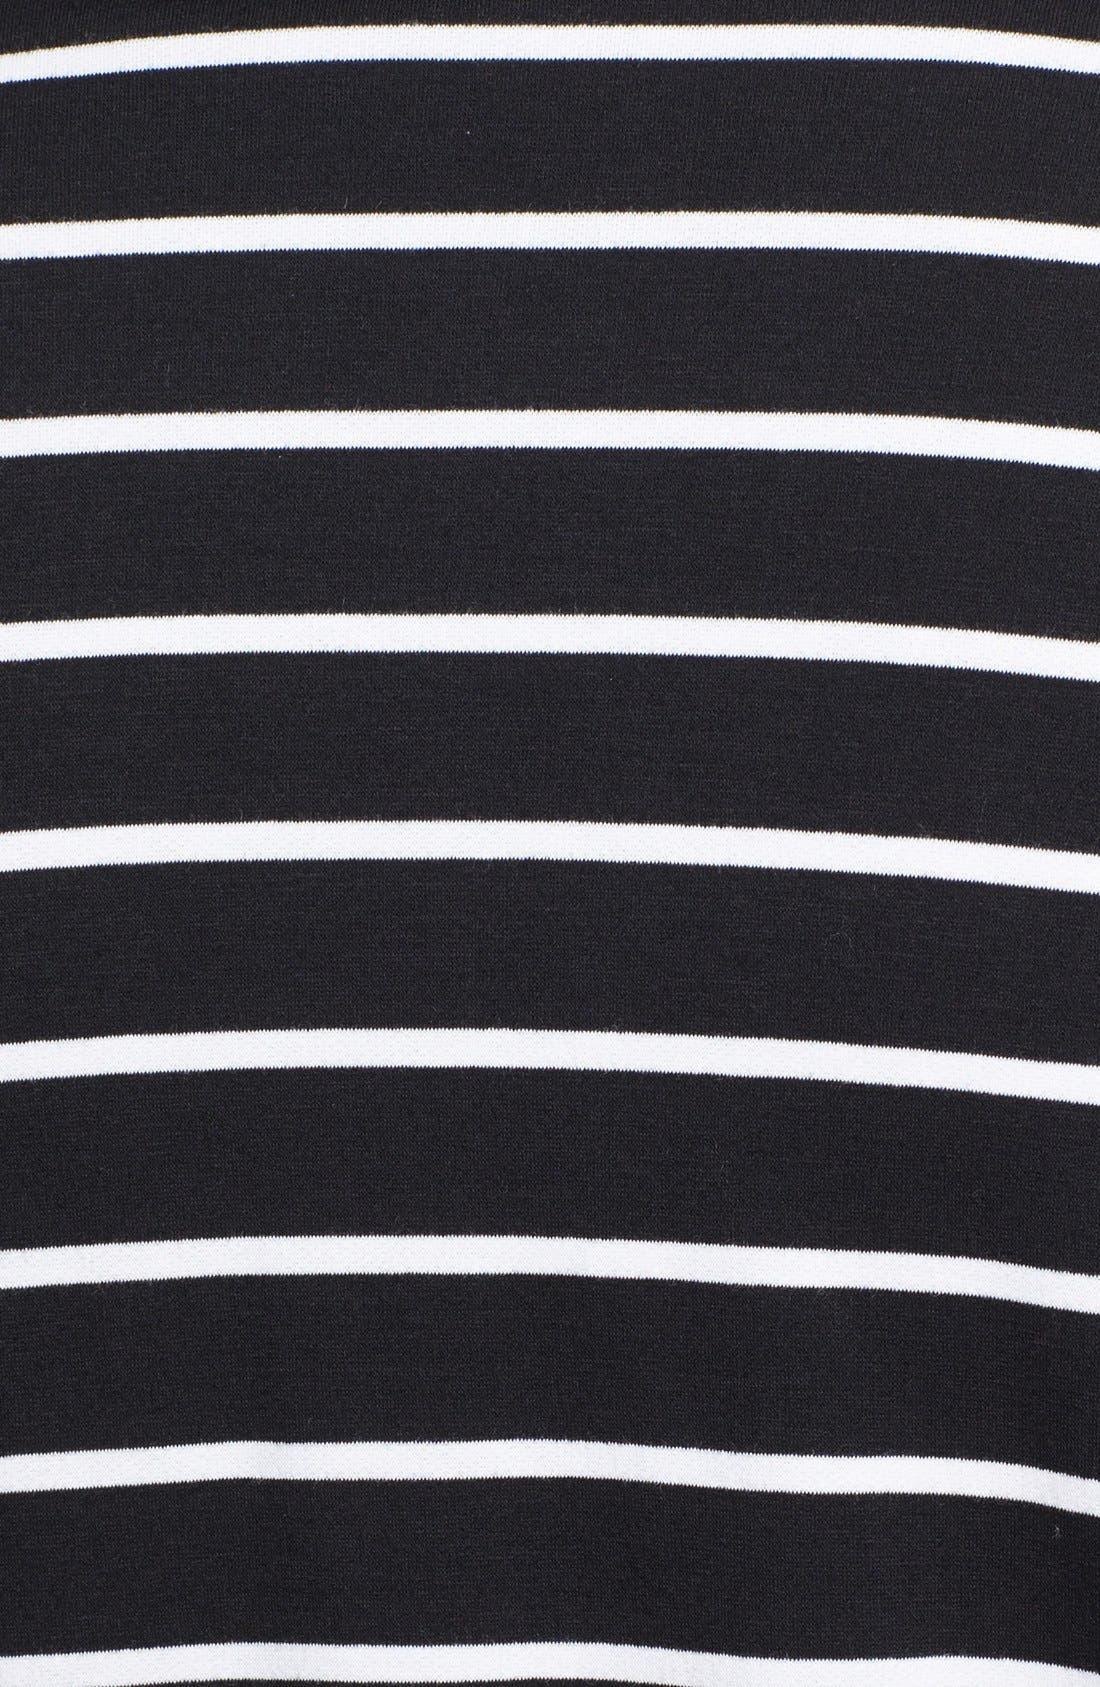 Stripe Fleece Wrap,                             Alternate thumbnail 15, color,